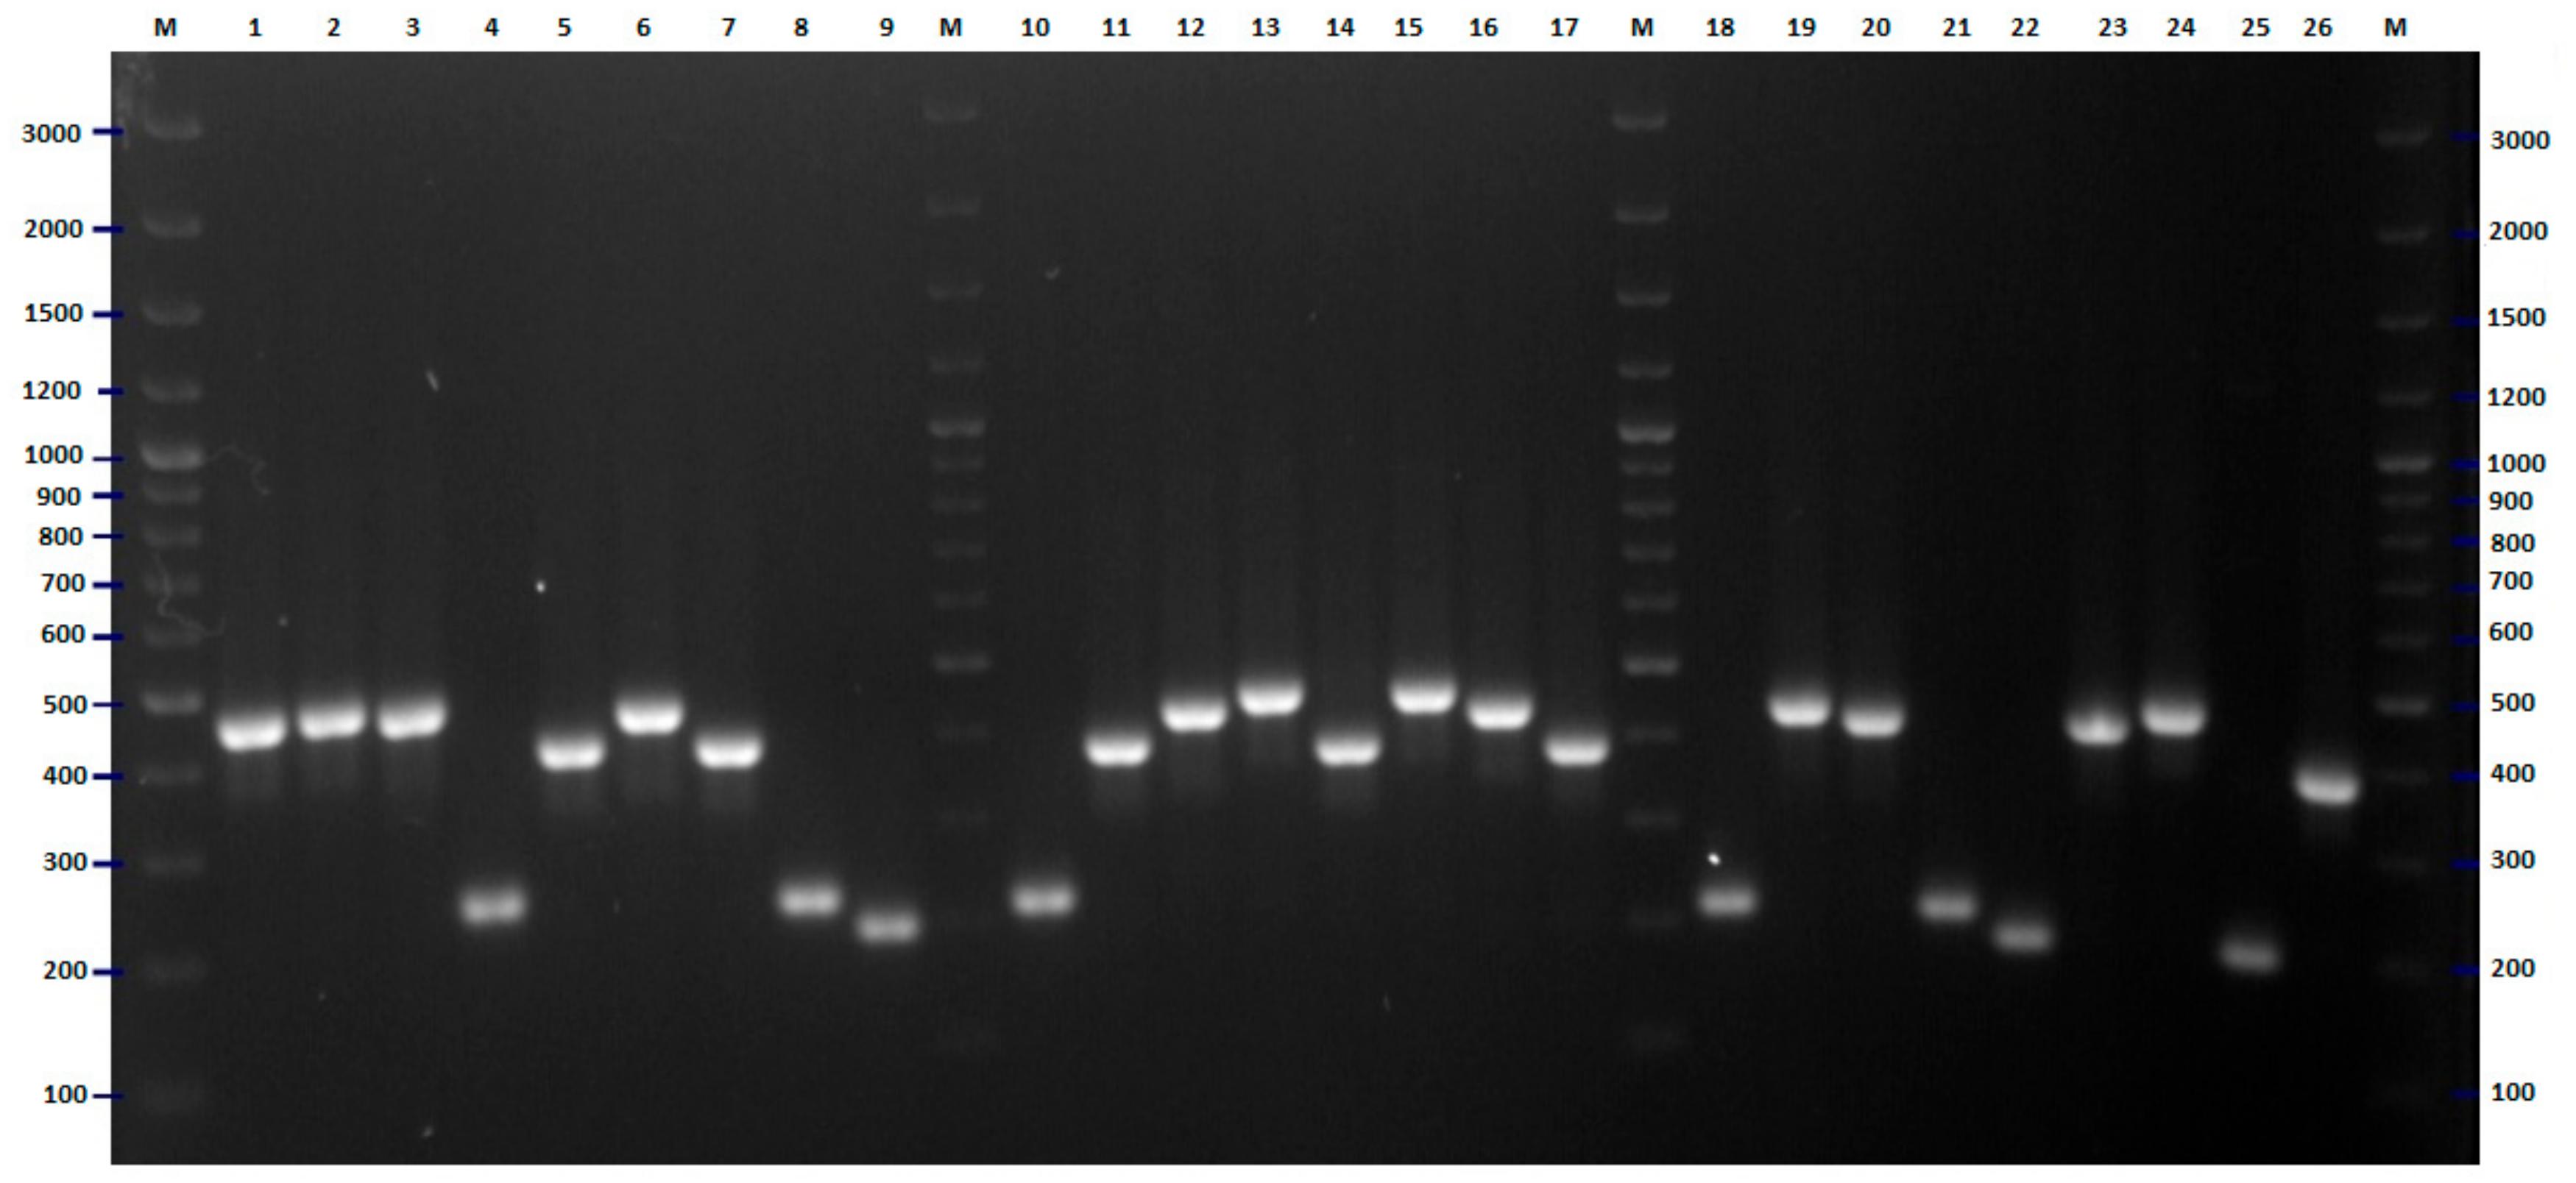 Hyperladder 100bp Bioline Meridian Bioscience